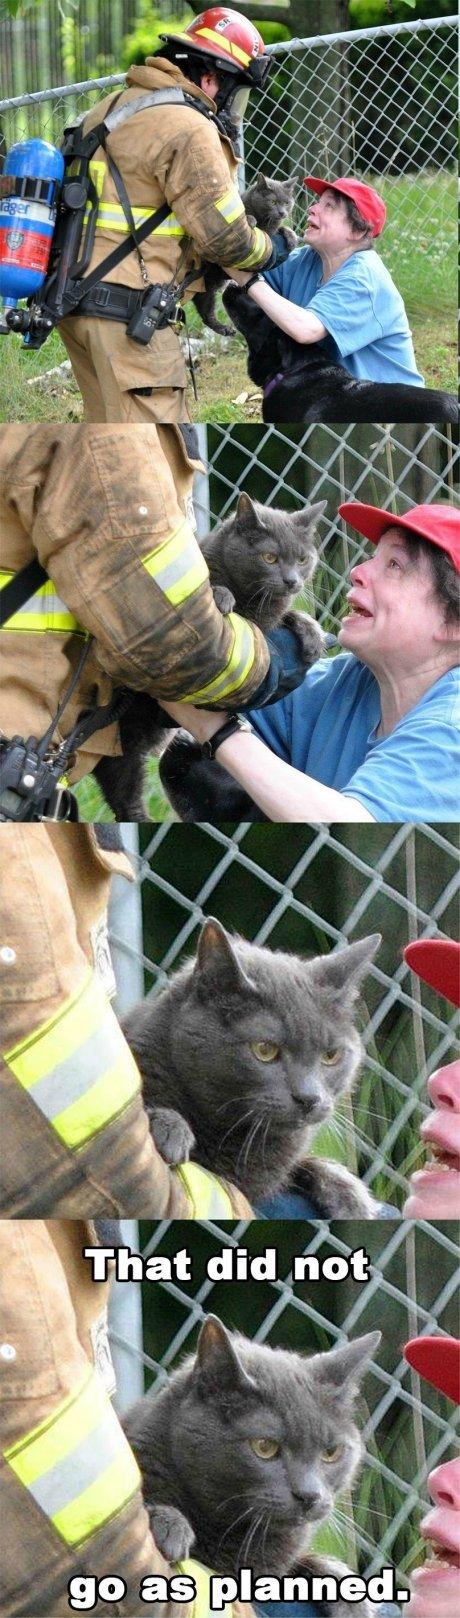 Cat face. . Cat face